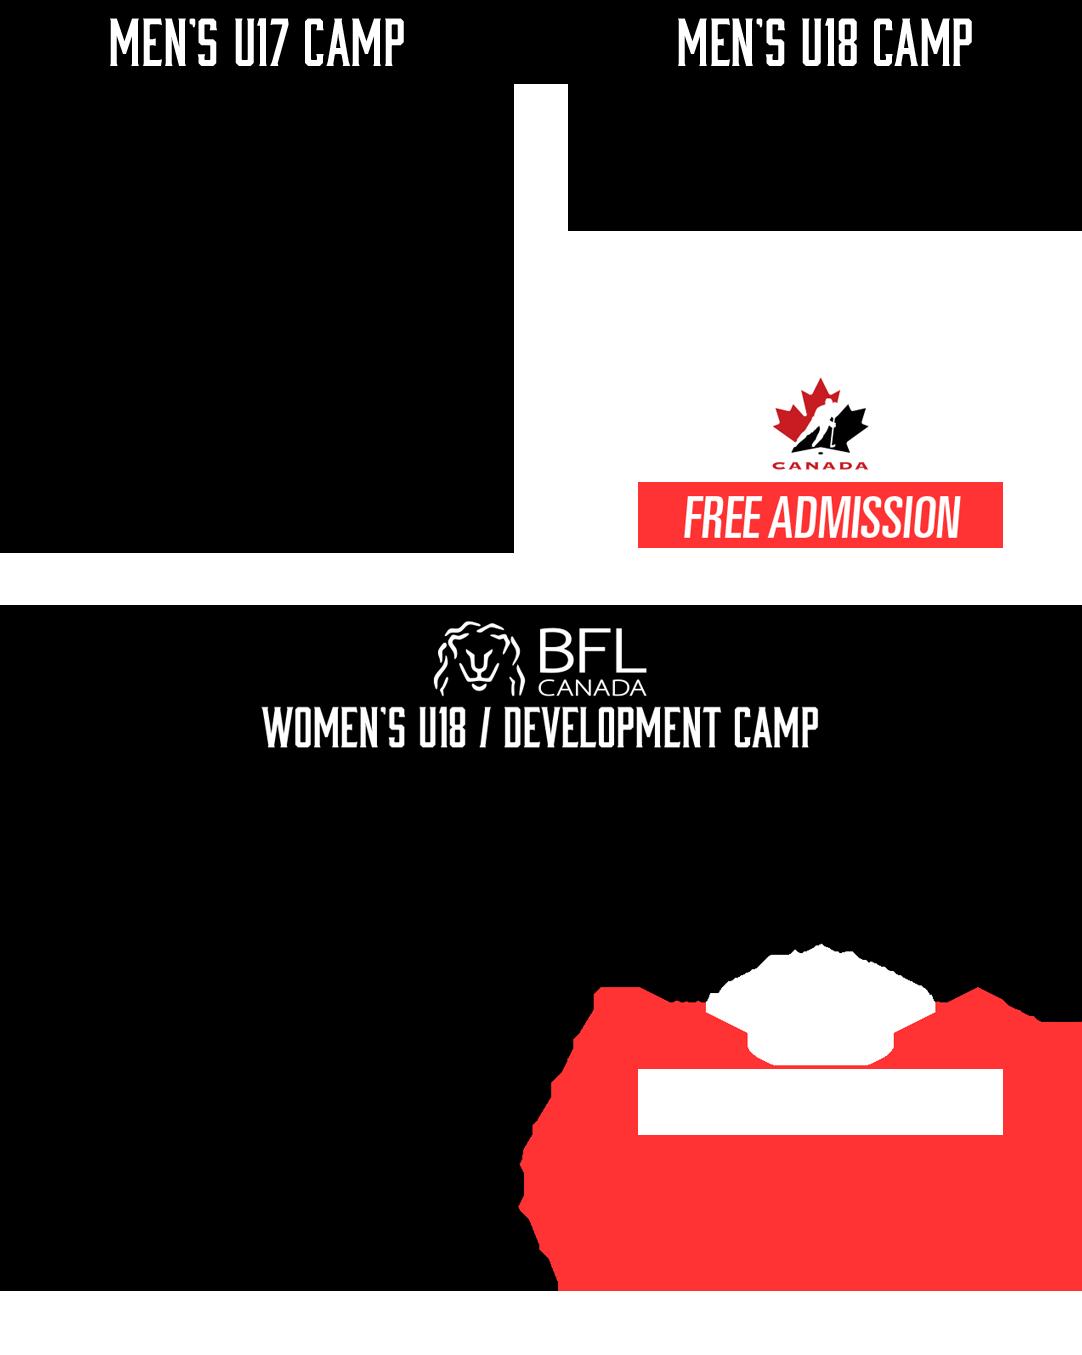 2019 Hockey Canada Summer Showcase schedule